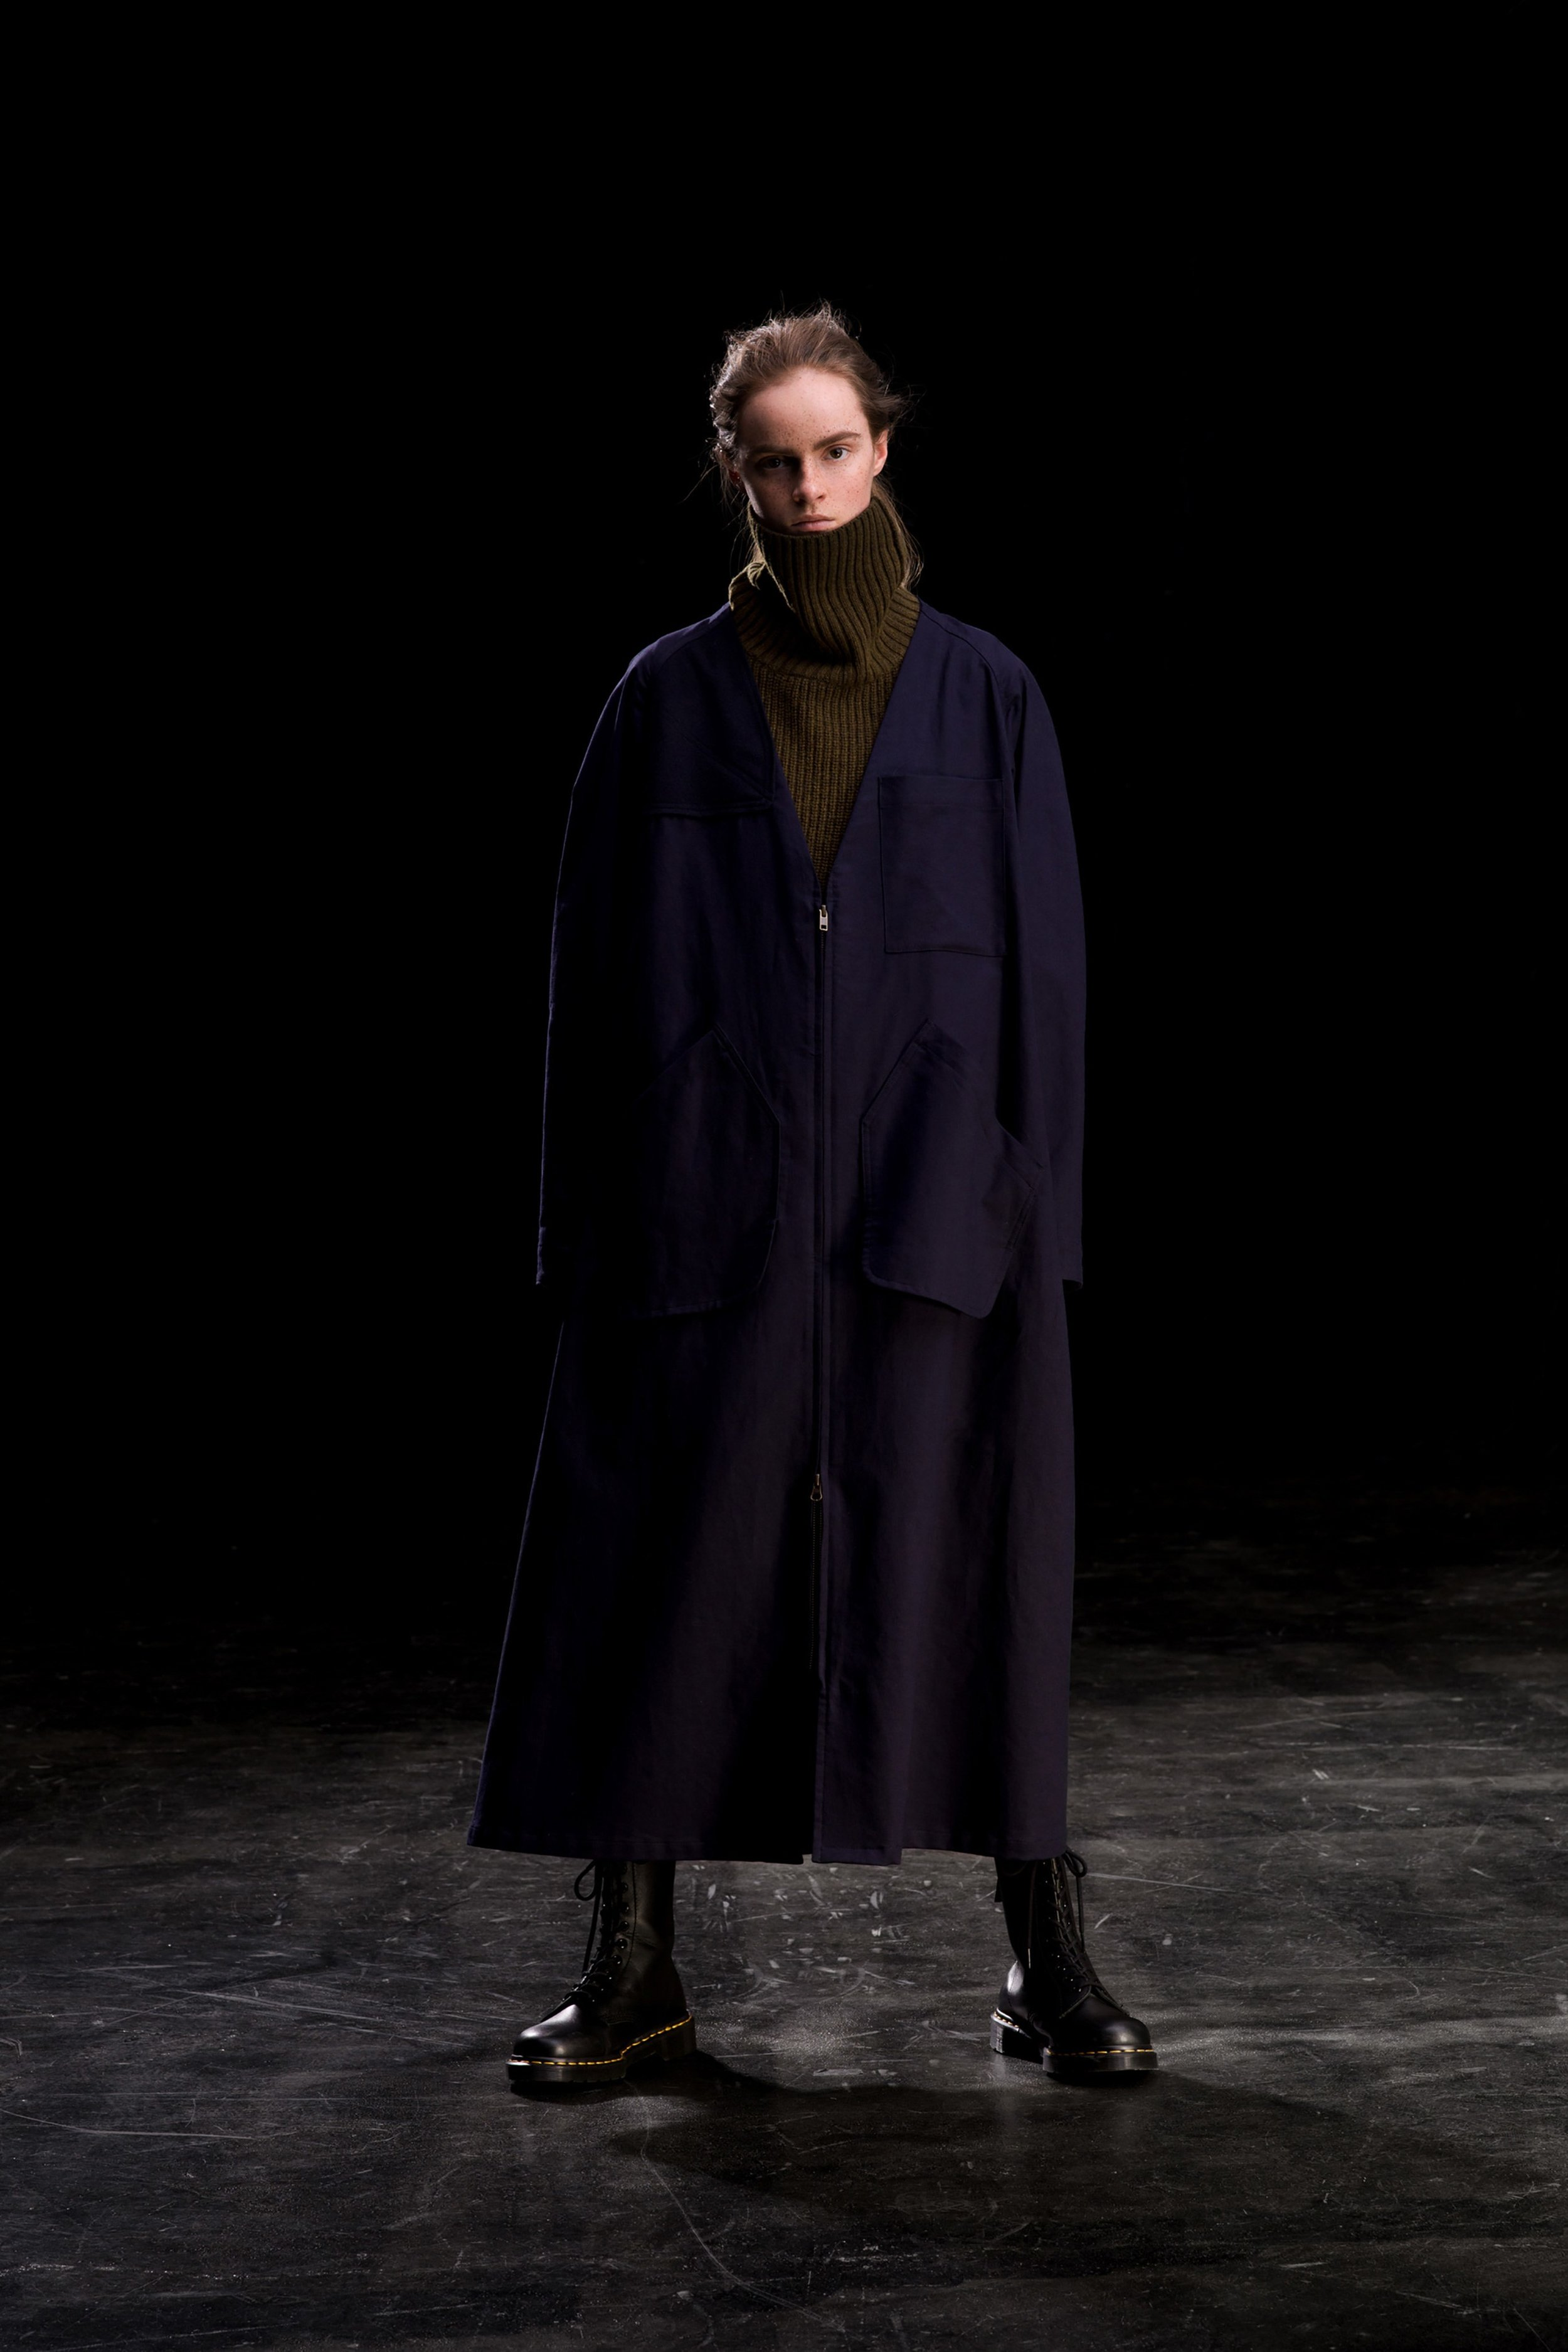 00022-Ys-Yohji-Yamamoto-FALL-19-Ready-To-Wear.jpg